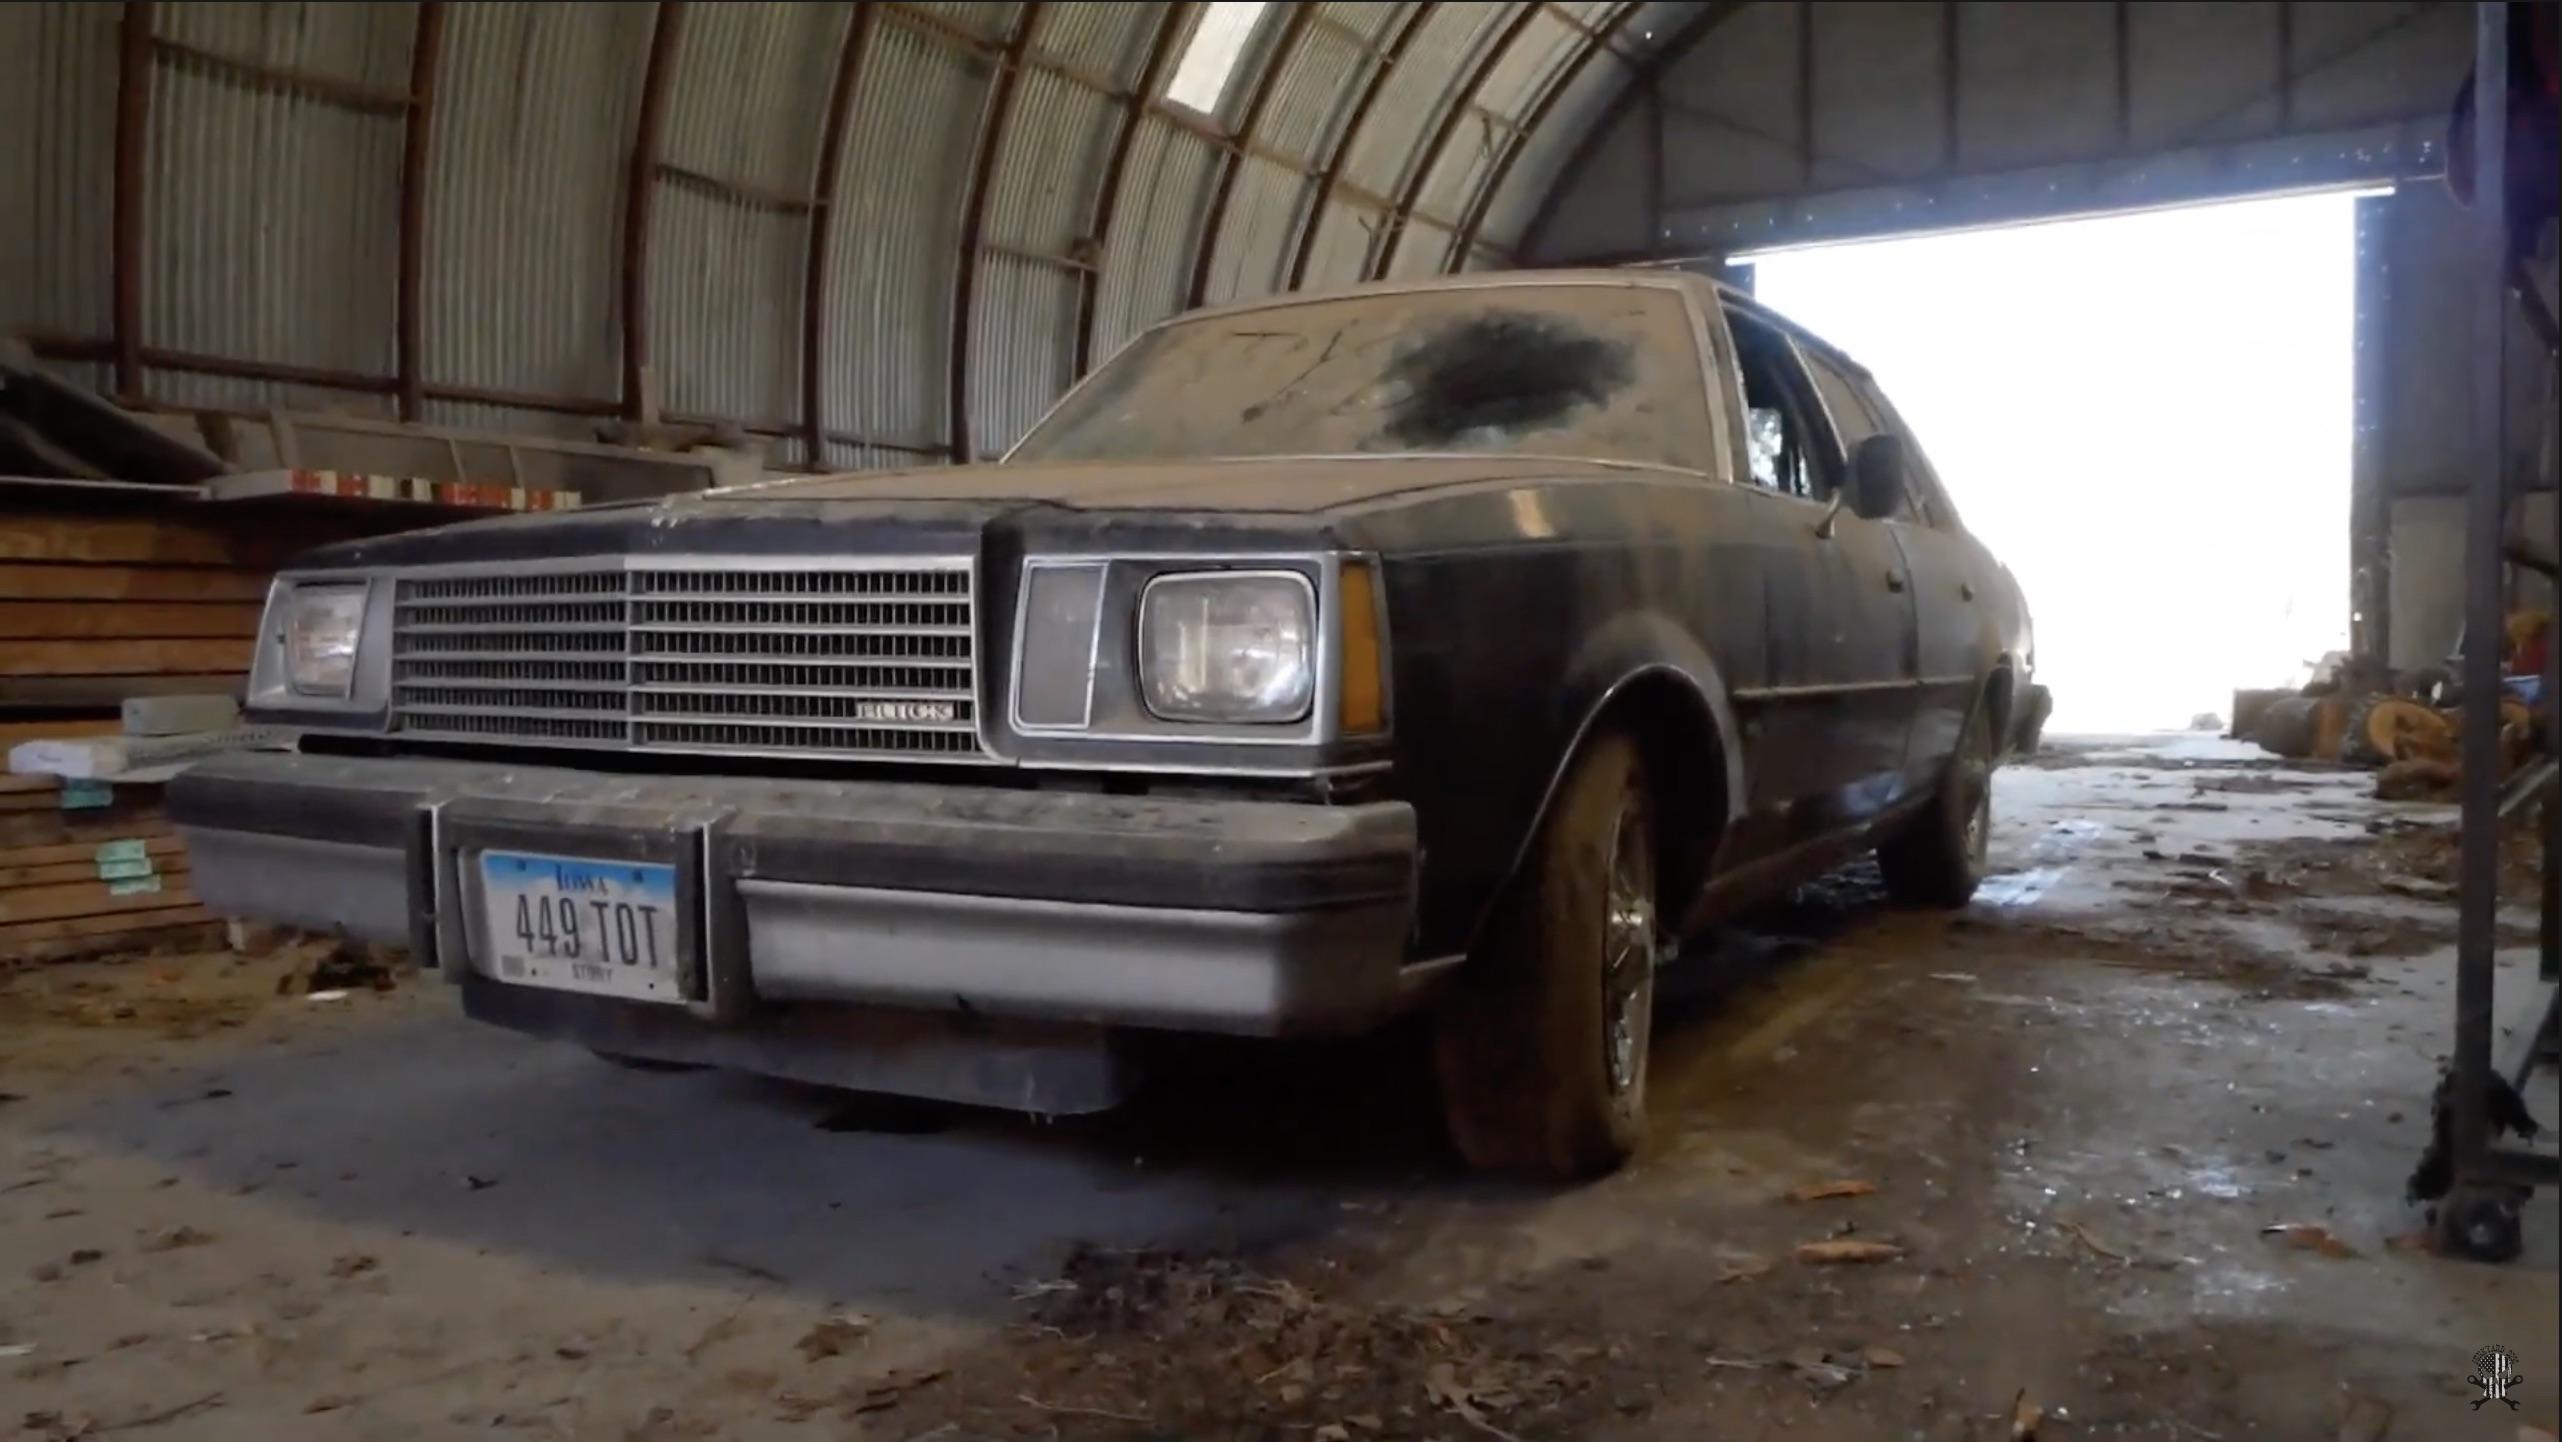 The Luxury HMMWV: We Got Junkyard Digs To Revive A Diesel-Powered Buick!